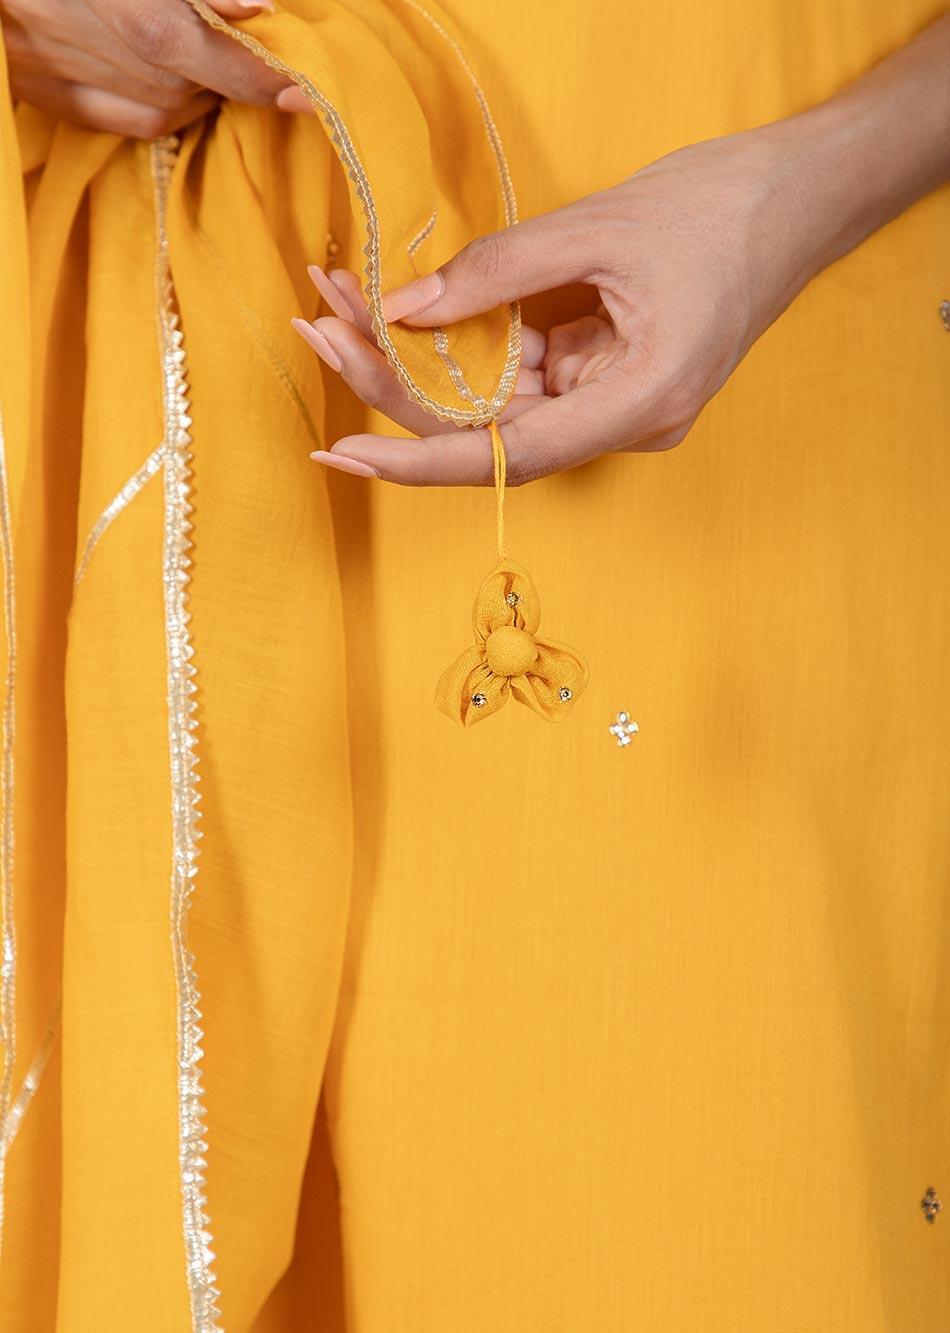 MOH Honey Sleeveless Set (set of 3) By Jovi Fashion